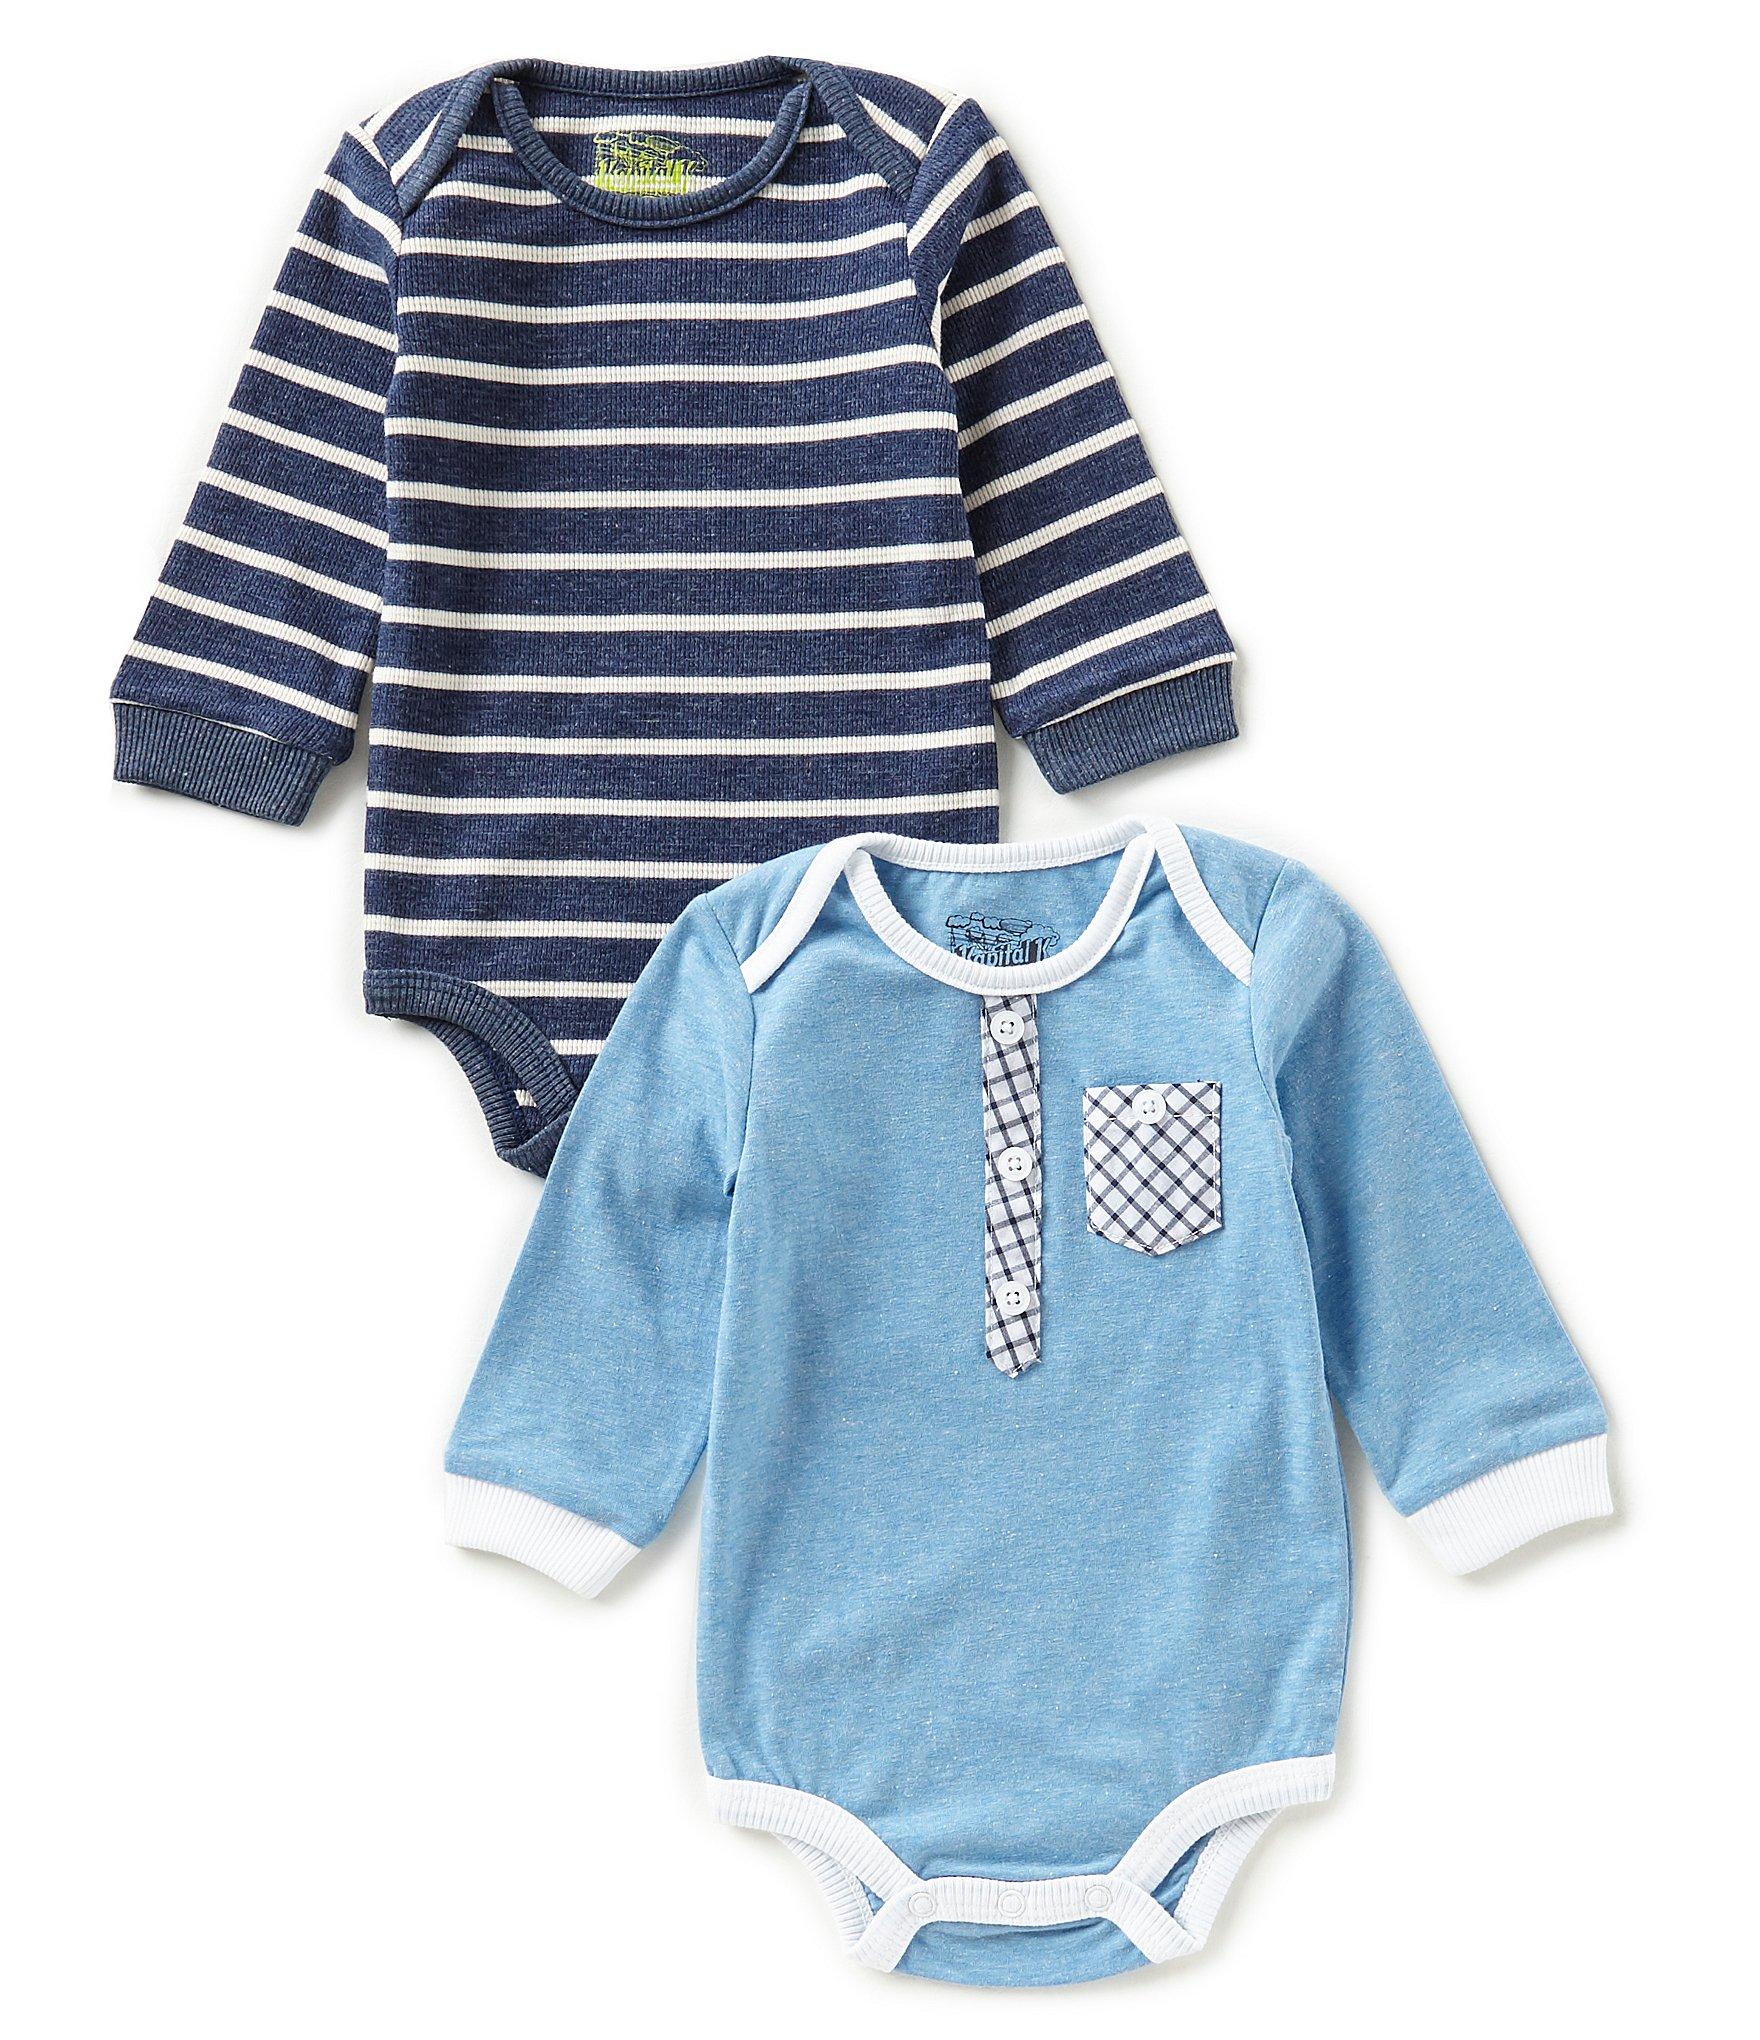 Kapital K Black Baby Boys Clothing | Dillards